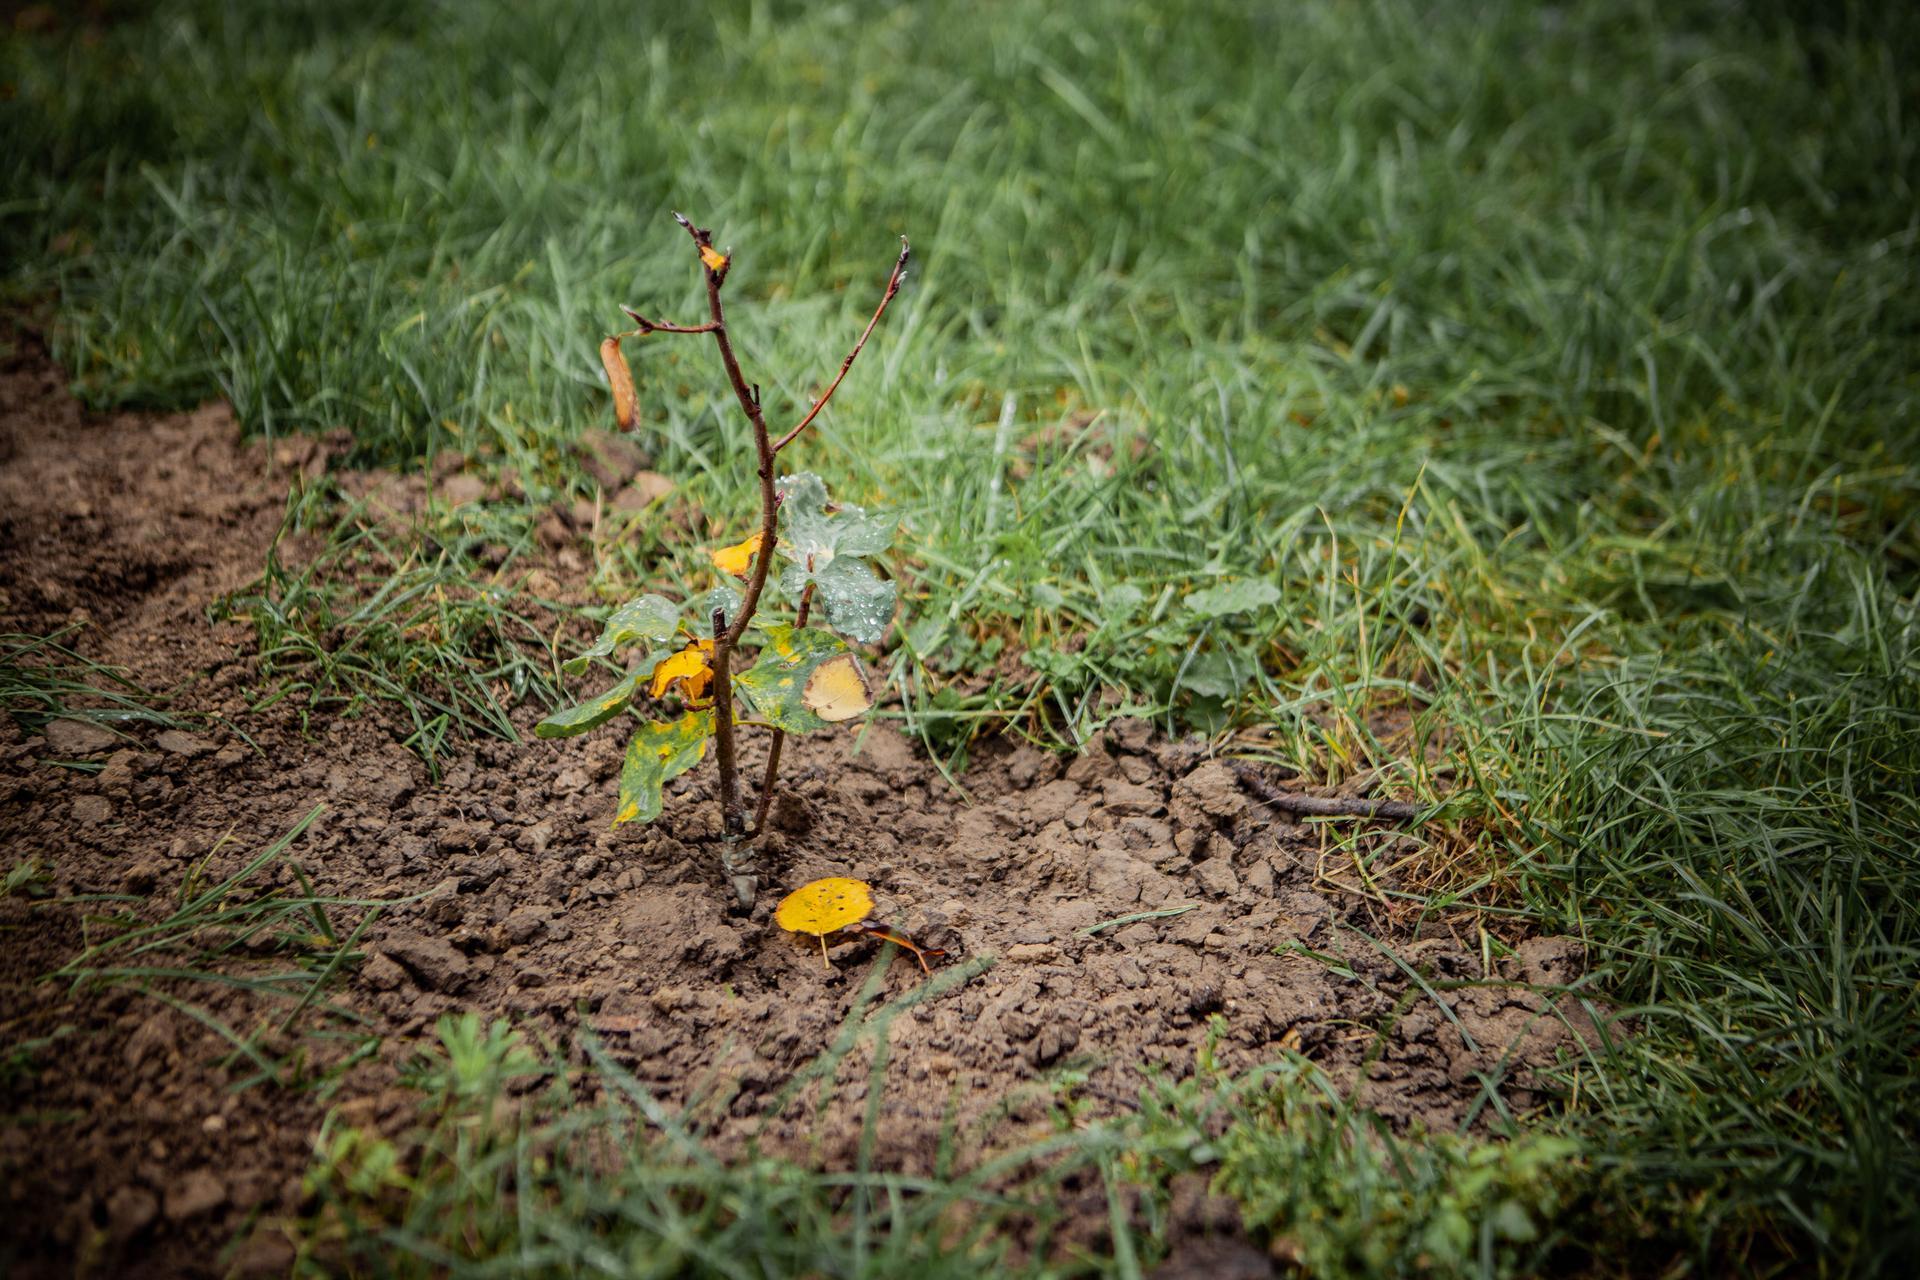 U nas v zahrade v roku 2020 - muchovnik ako vetrolam